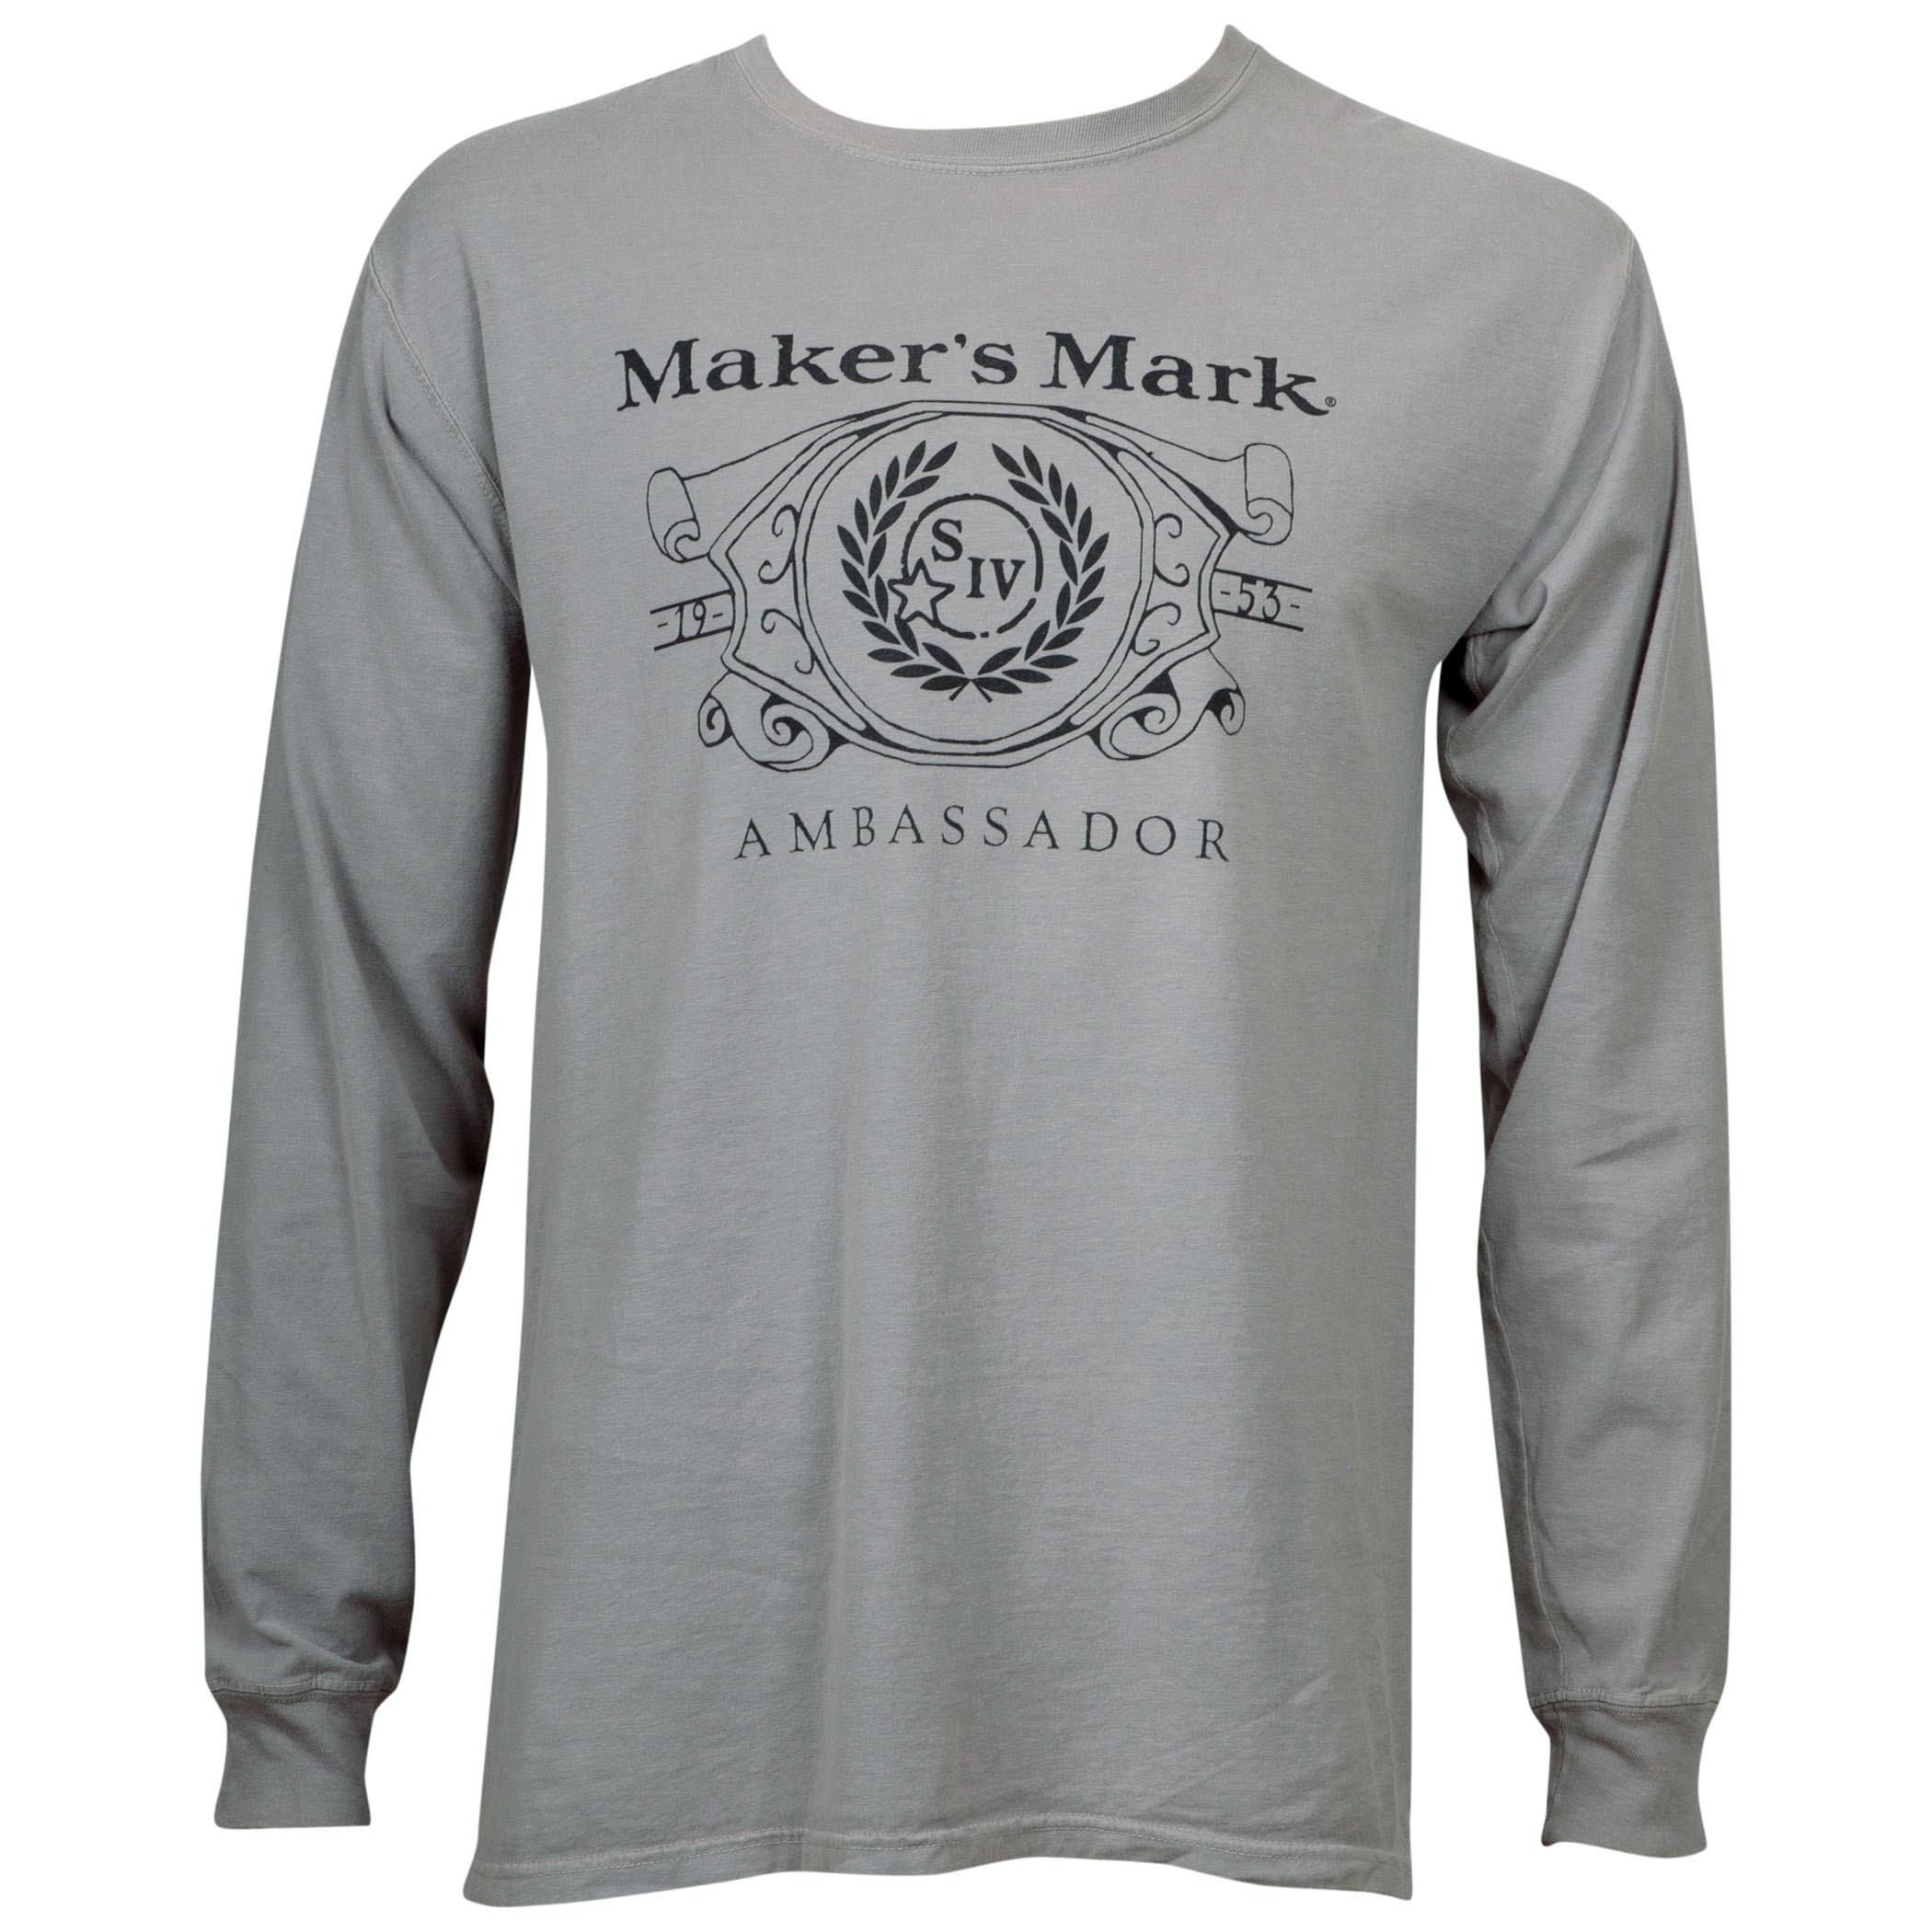 Maker's Mark Eco Friendly Grey Long Sleeve Shirt